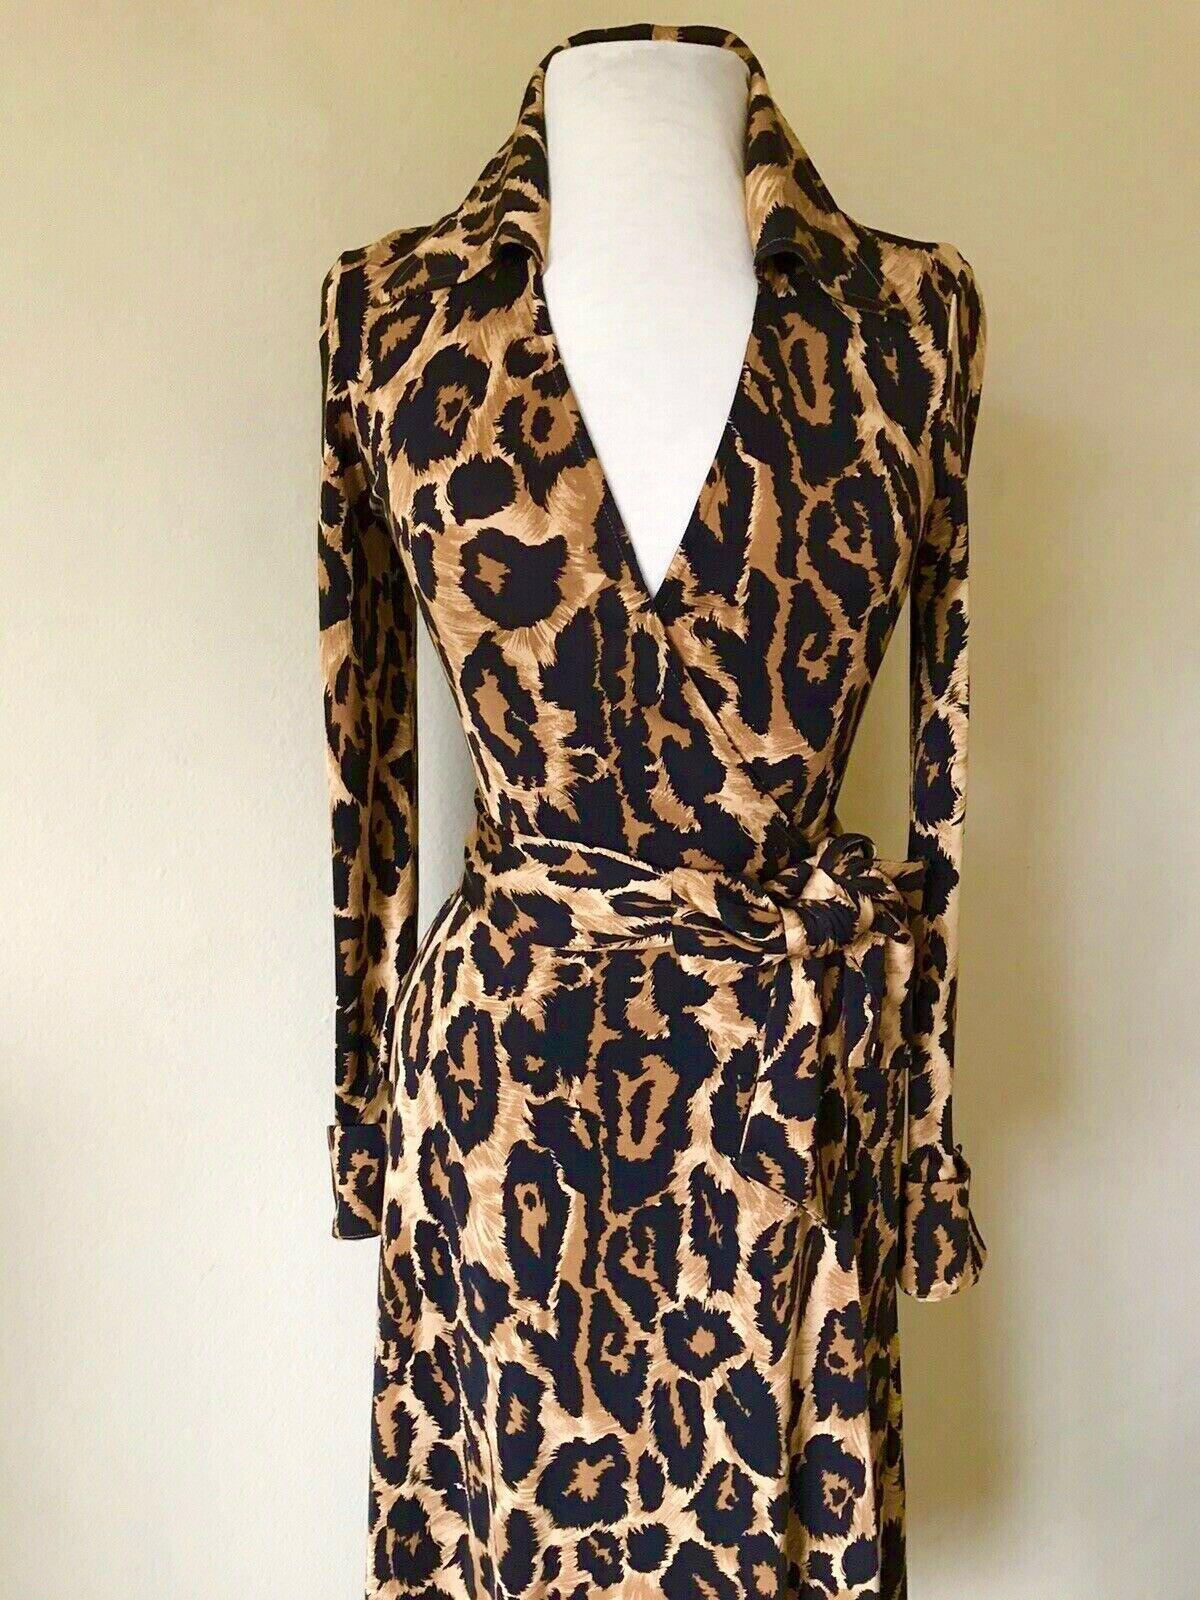 398 Diane Von Furstenberg Julie Vintage Classic Leopard Silk Wrap Dress 4 6 Silk Wrap Dresses Jersey Wrap Dress Maxi Gown Dress [ 1600 x 1200 Pixel ]